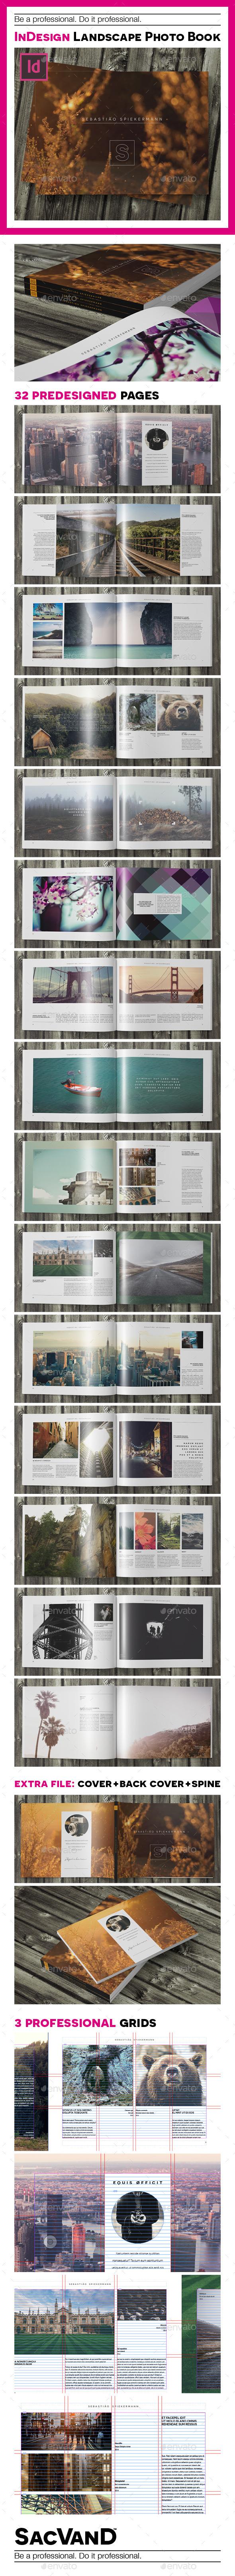 GraphicRiver Indesign landscape photo book template 9121284